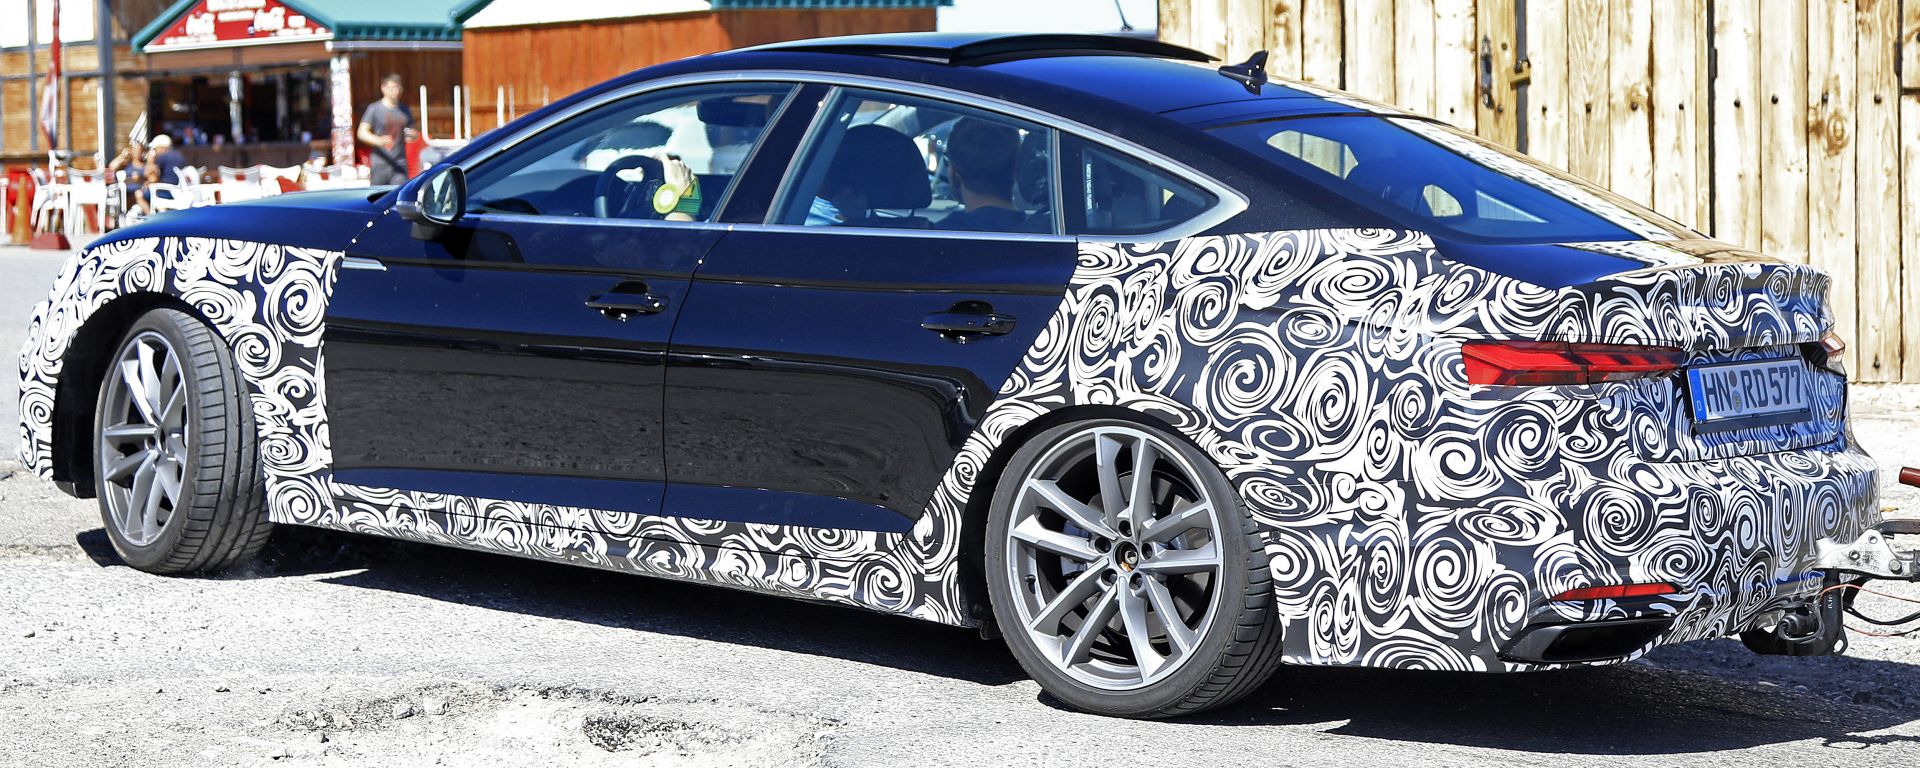 Audi A5 Sportback, prime foto spia del restyling 2020